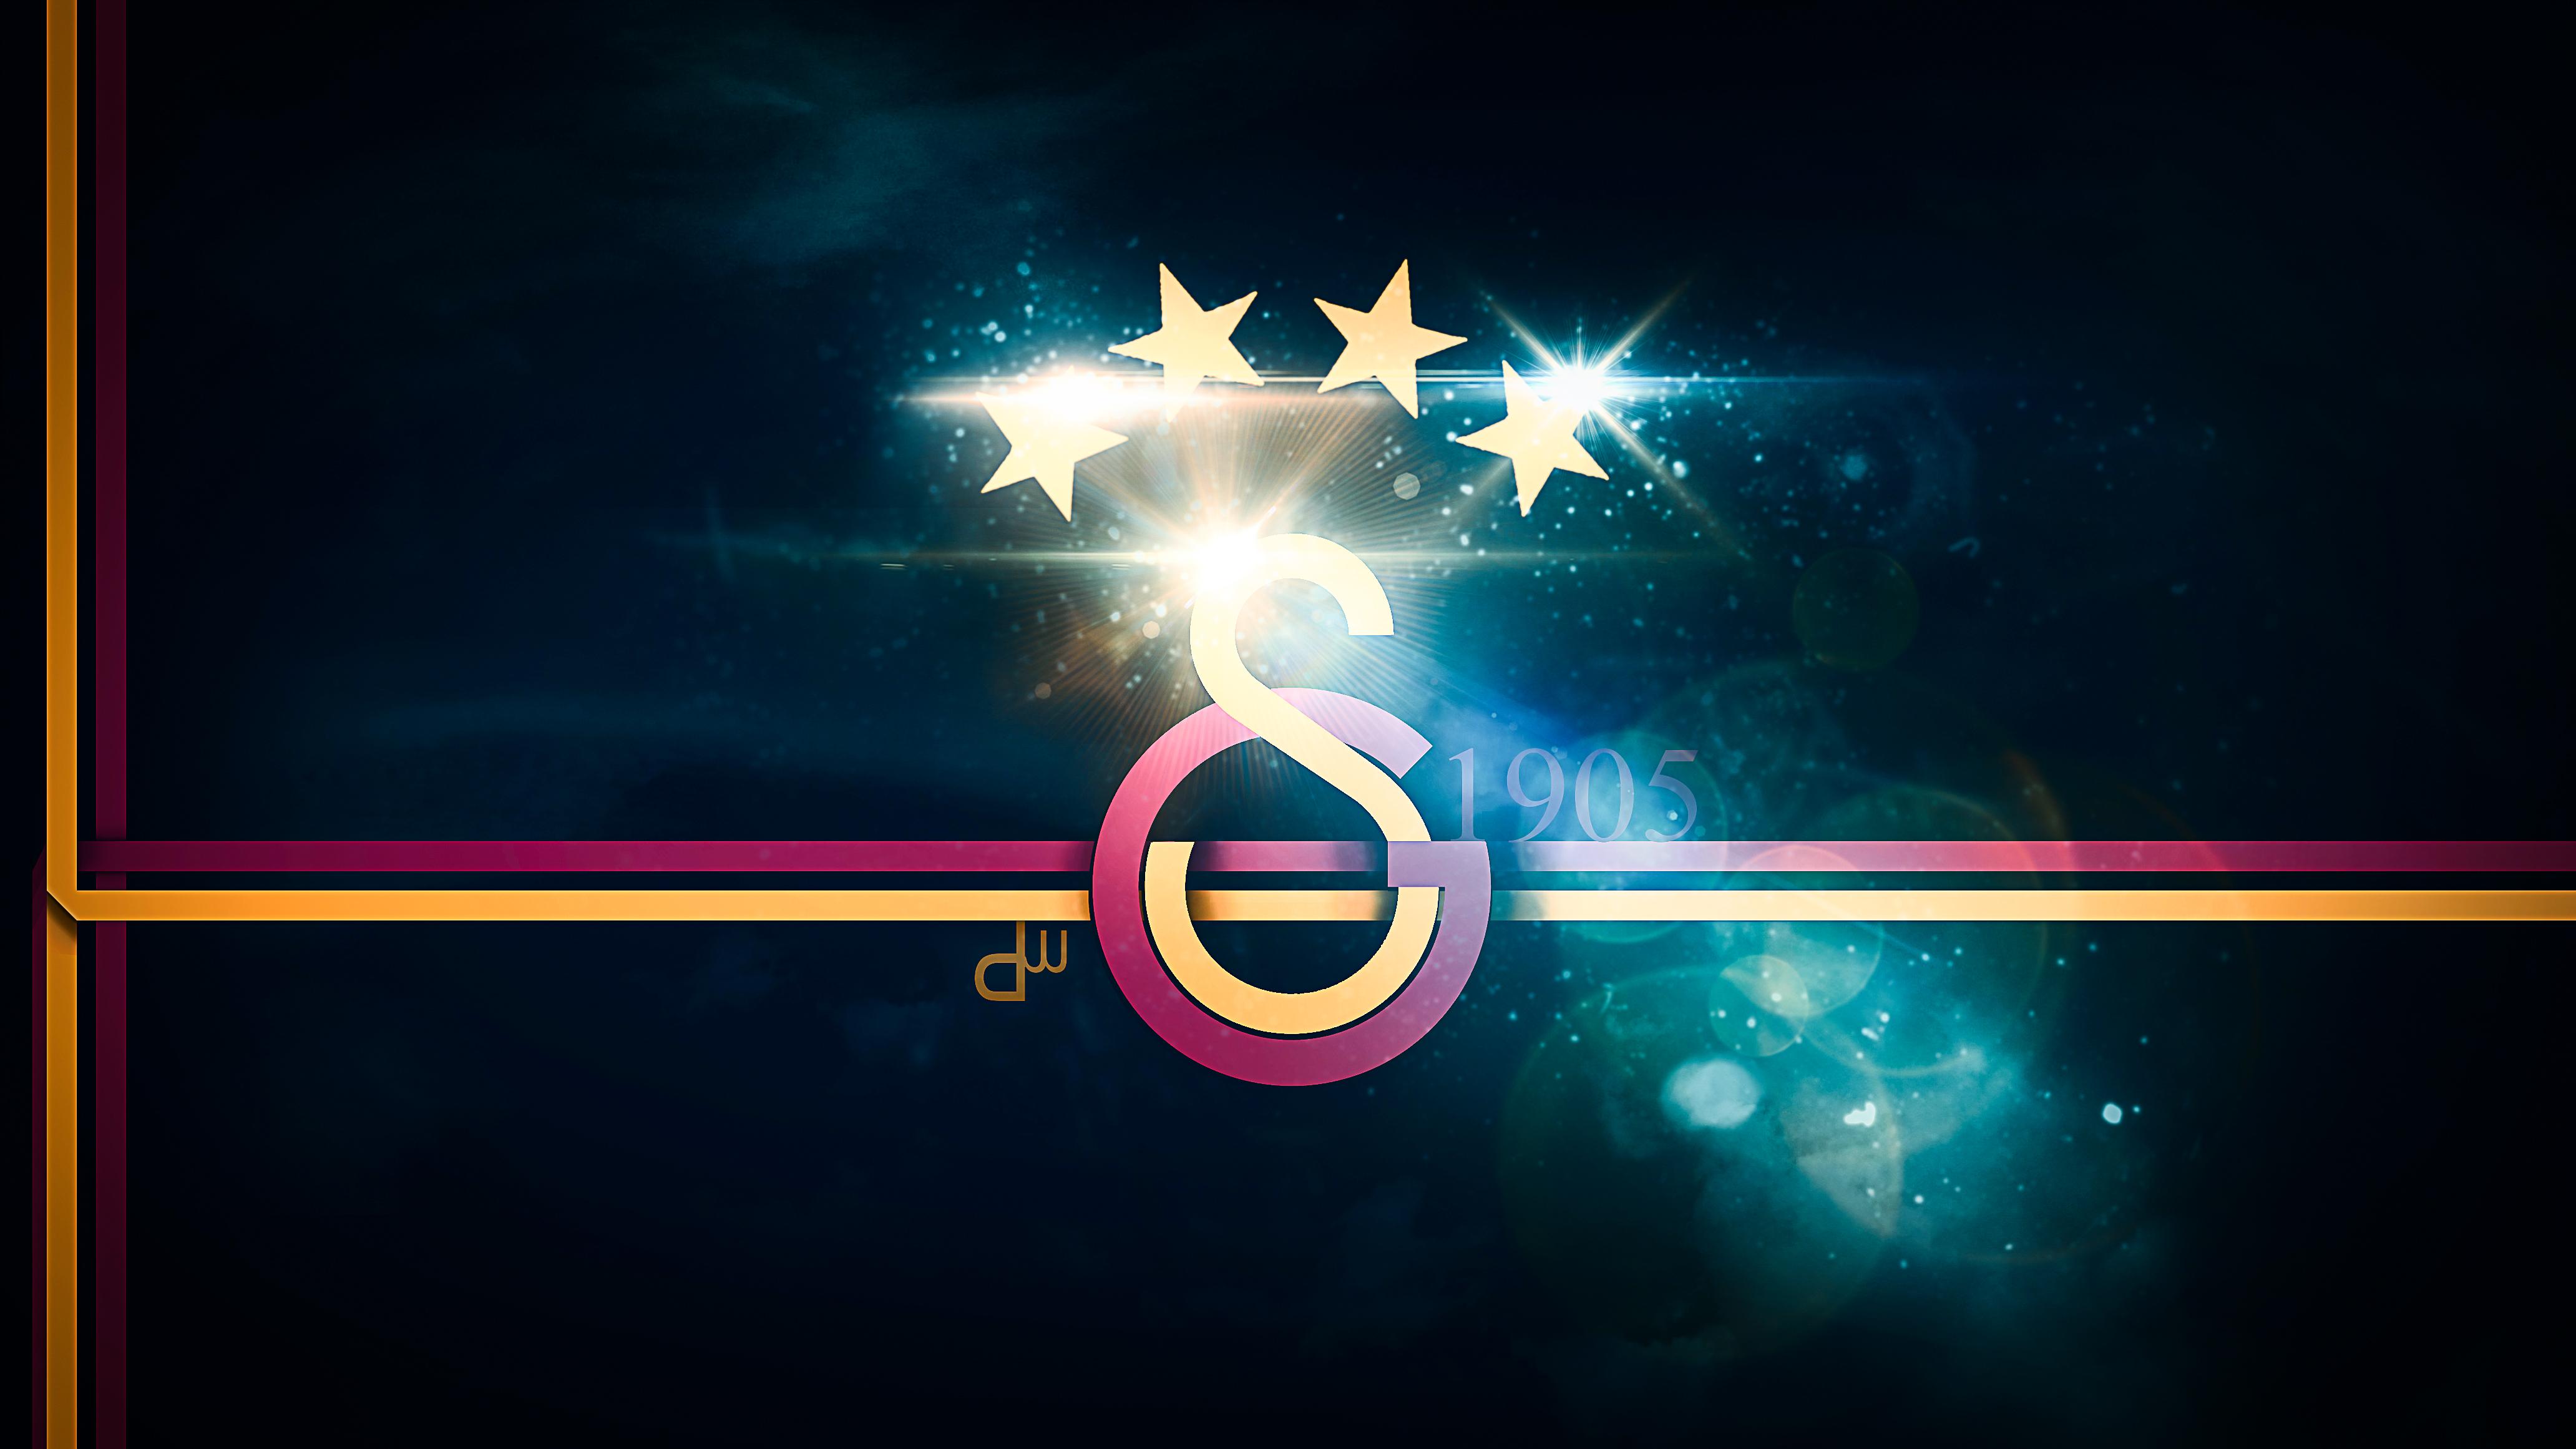 4 Yildiz Galatasaray Wallpaper 4 Sterne Stars By Darklmx